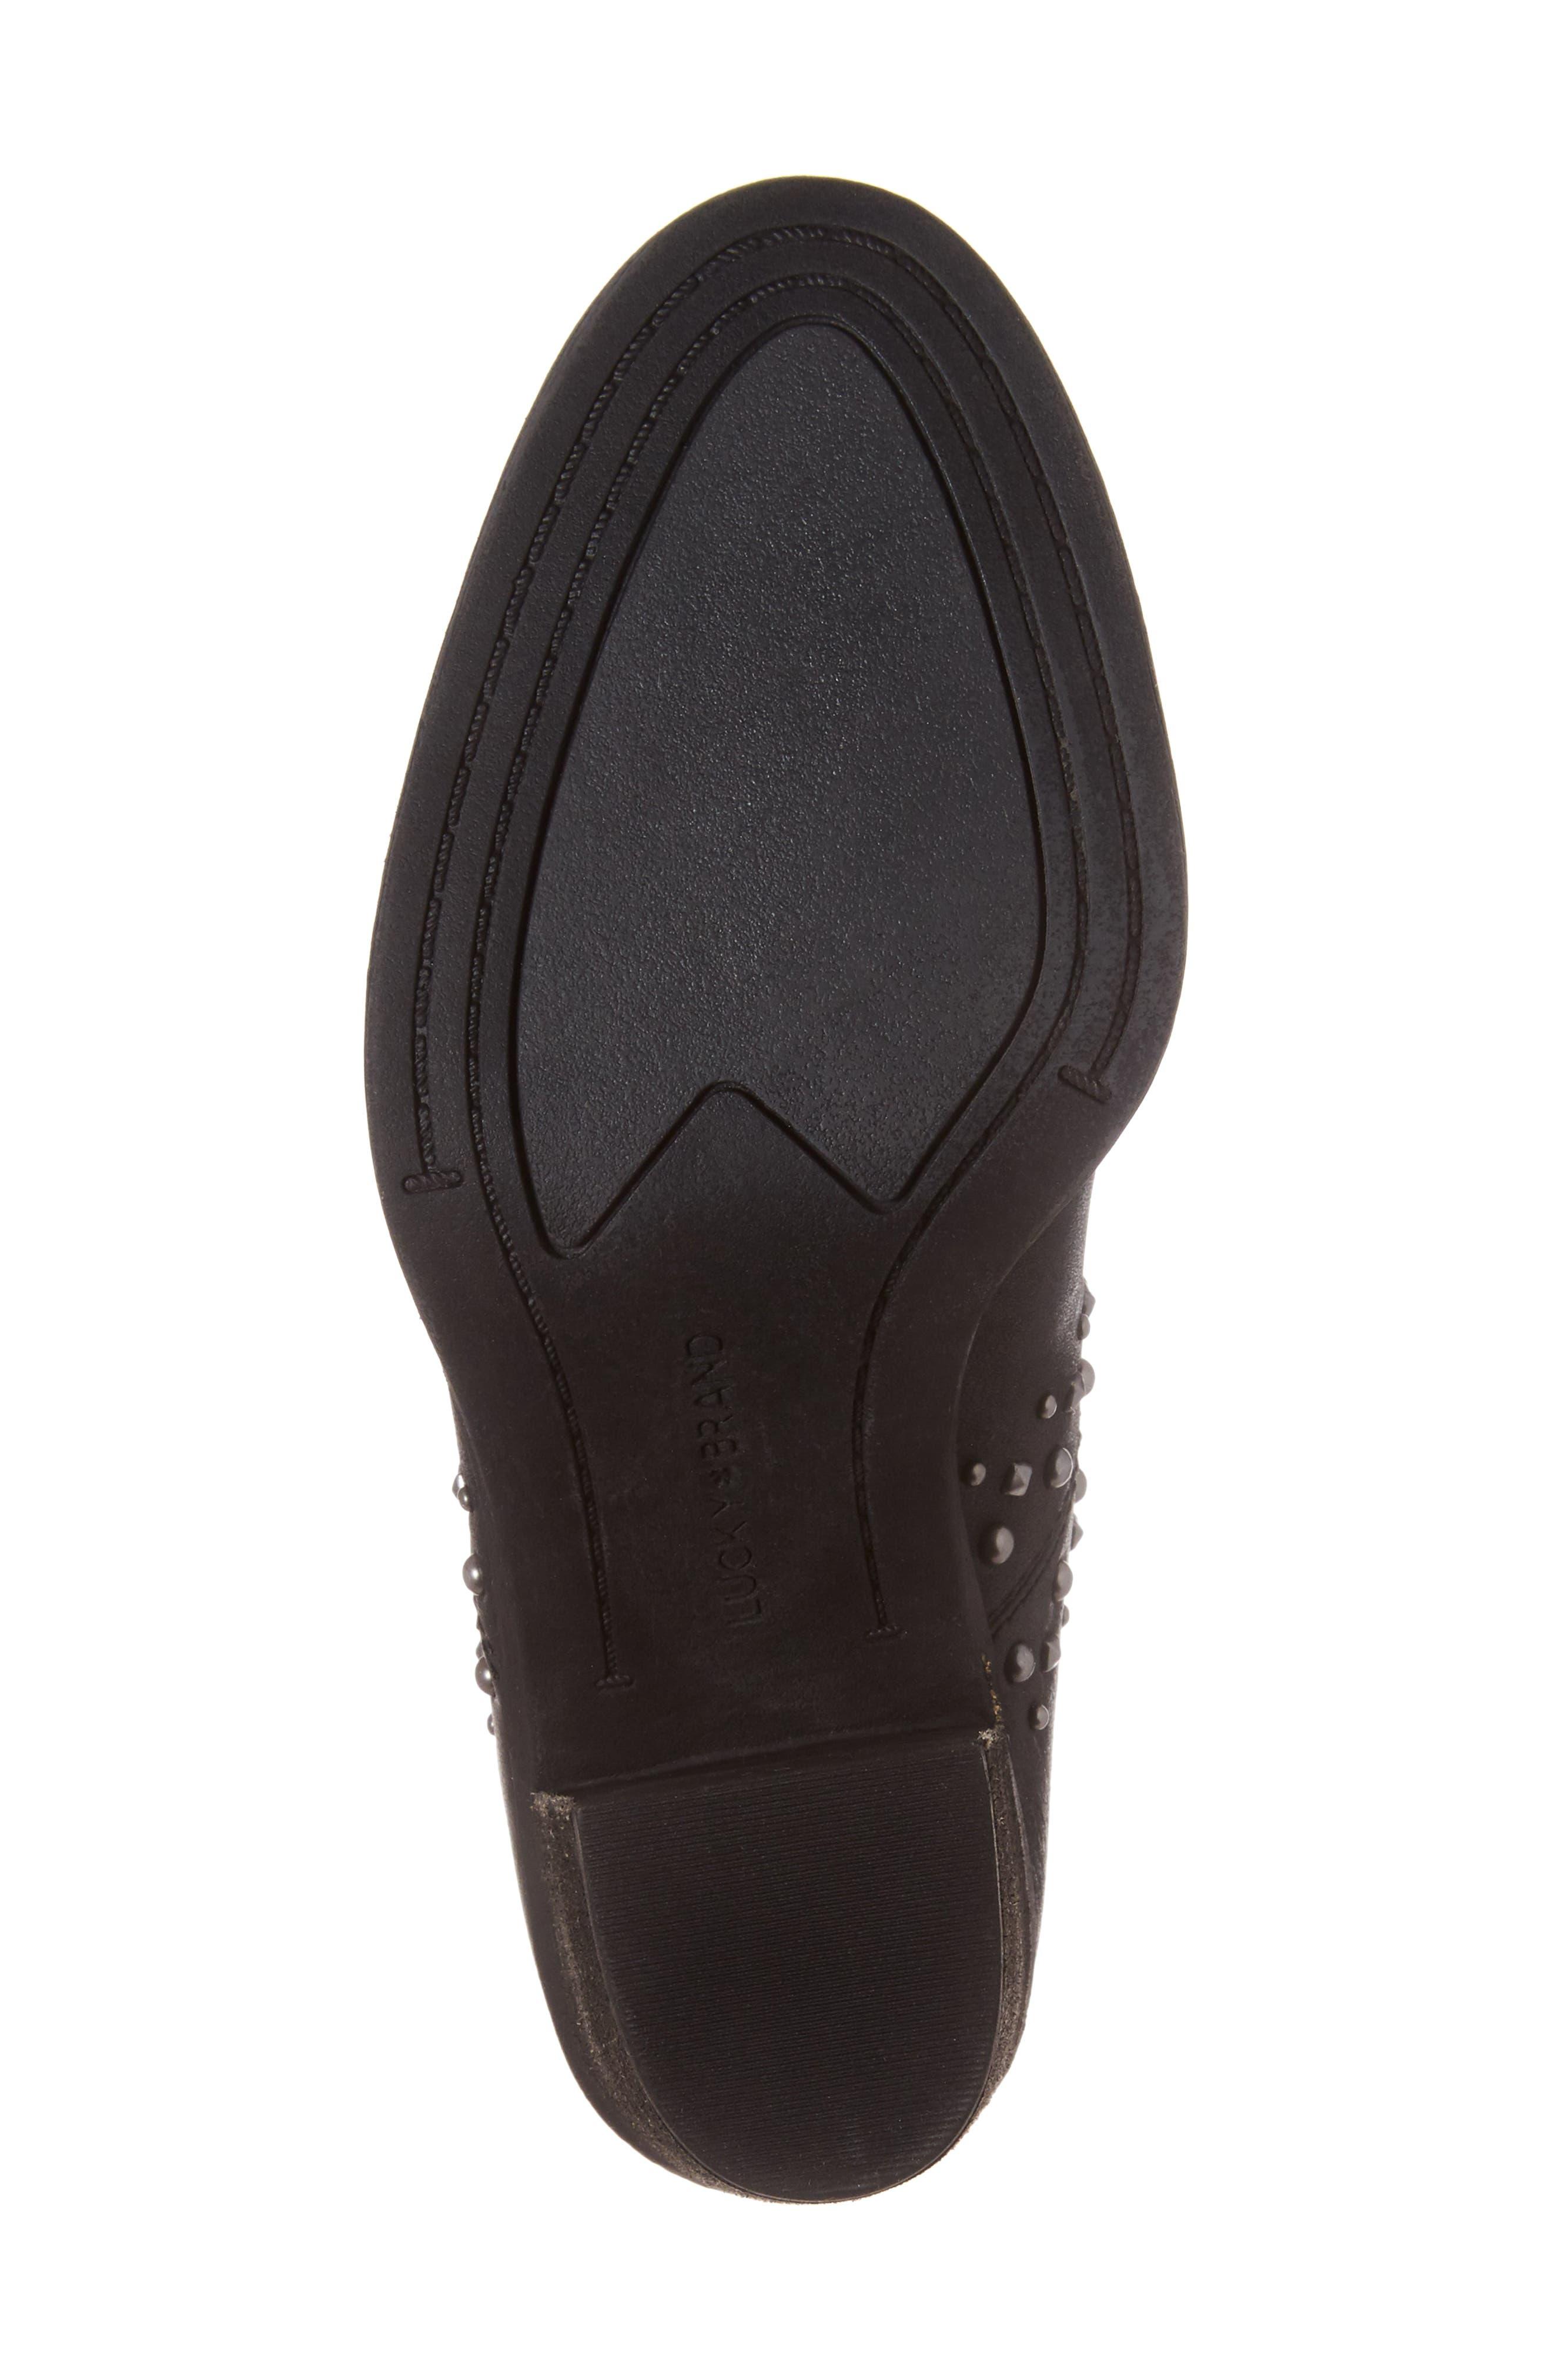 Sancha Studded Bootie,                             Alternate thumbnail 6, color,                             Black Leather